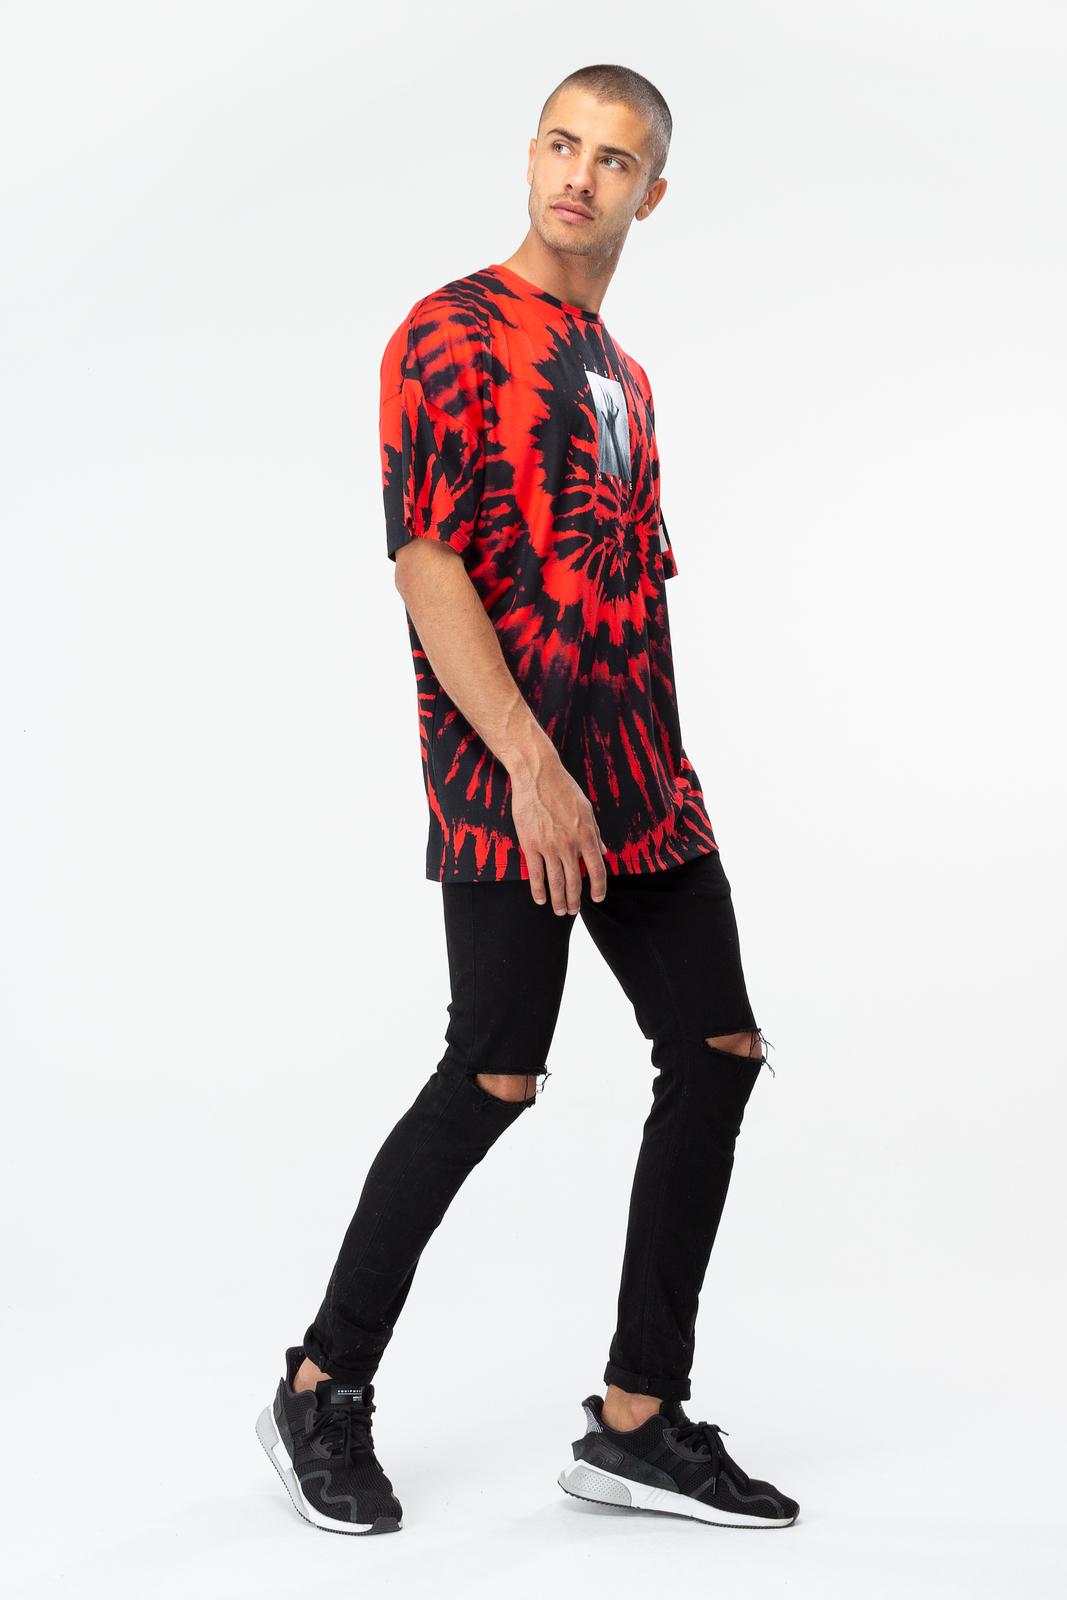 Just Hype: Men's Oversized T-Shirt- Psycho Tie Dye XL image